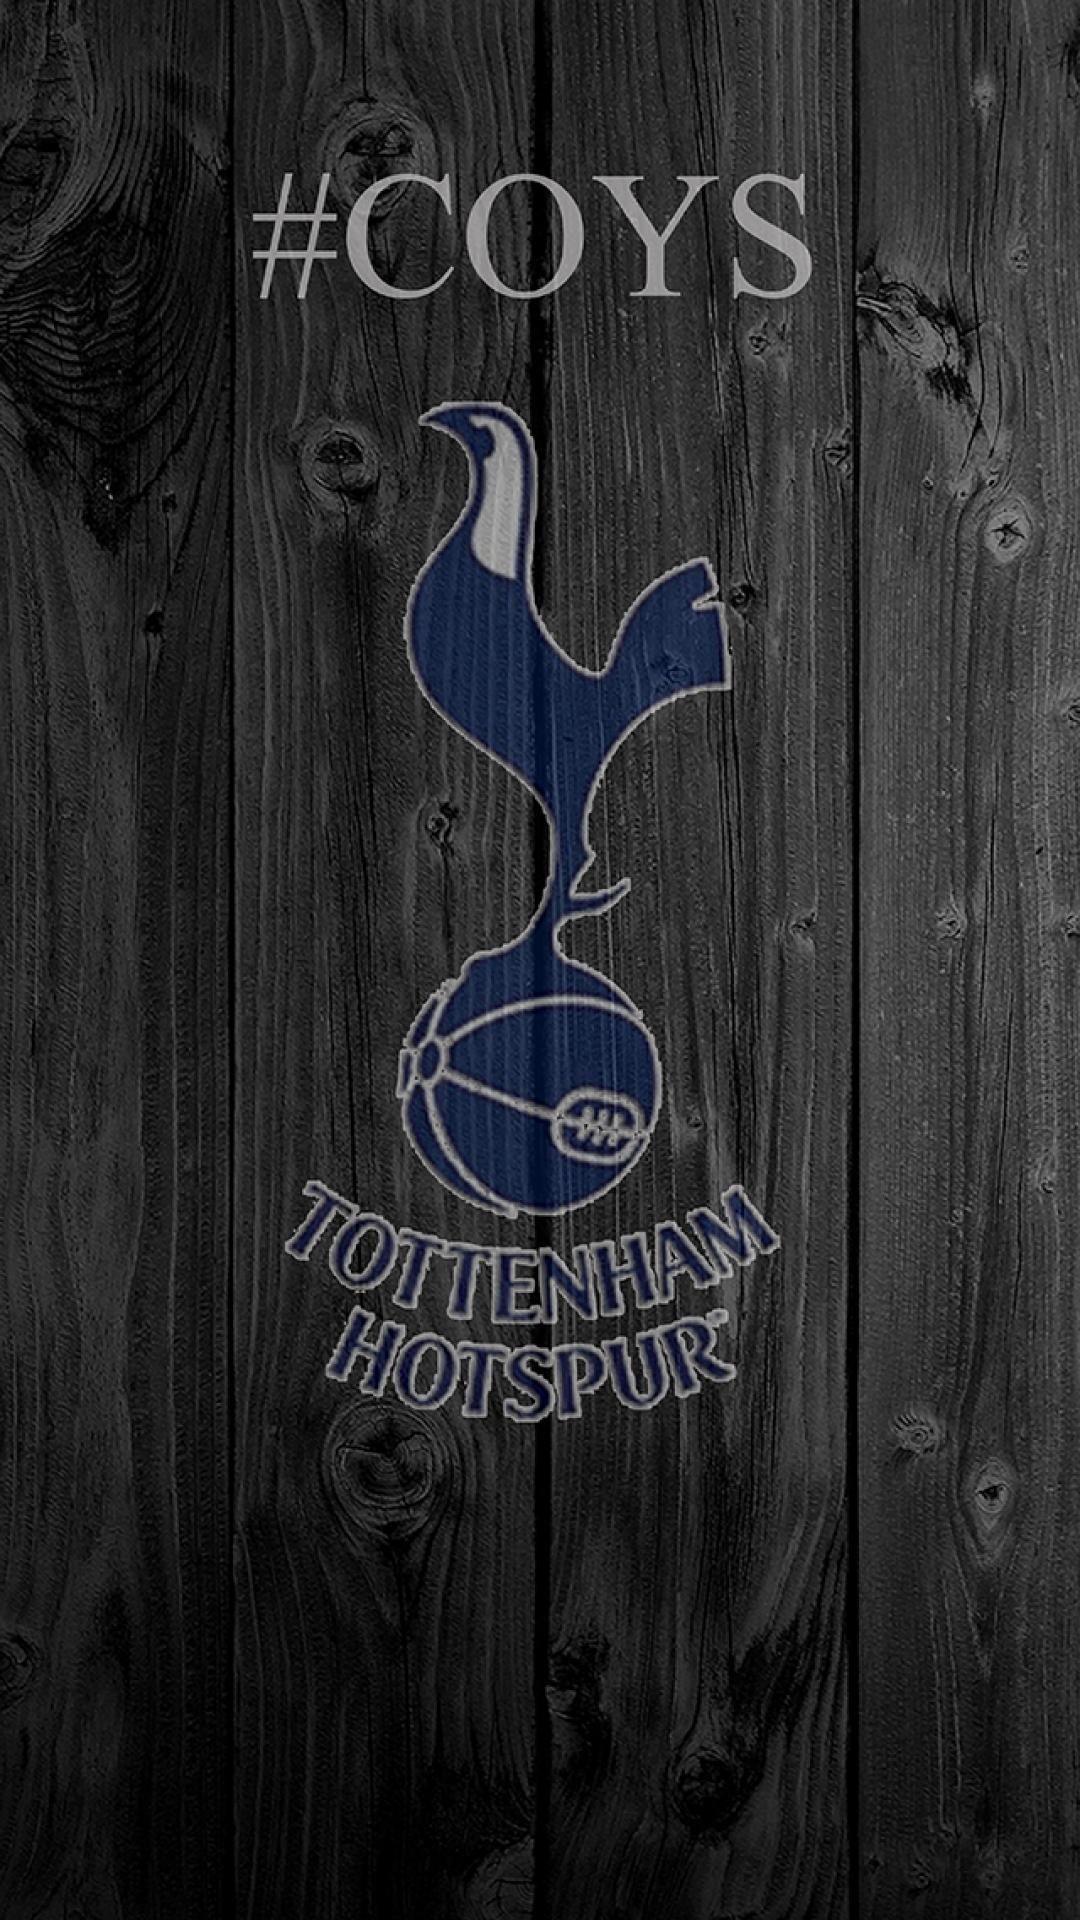 Tottenham Hotspur Background Wallpaper Hd With Highresolution